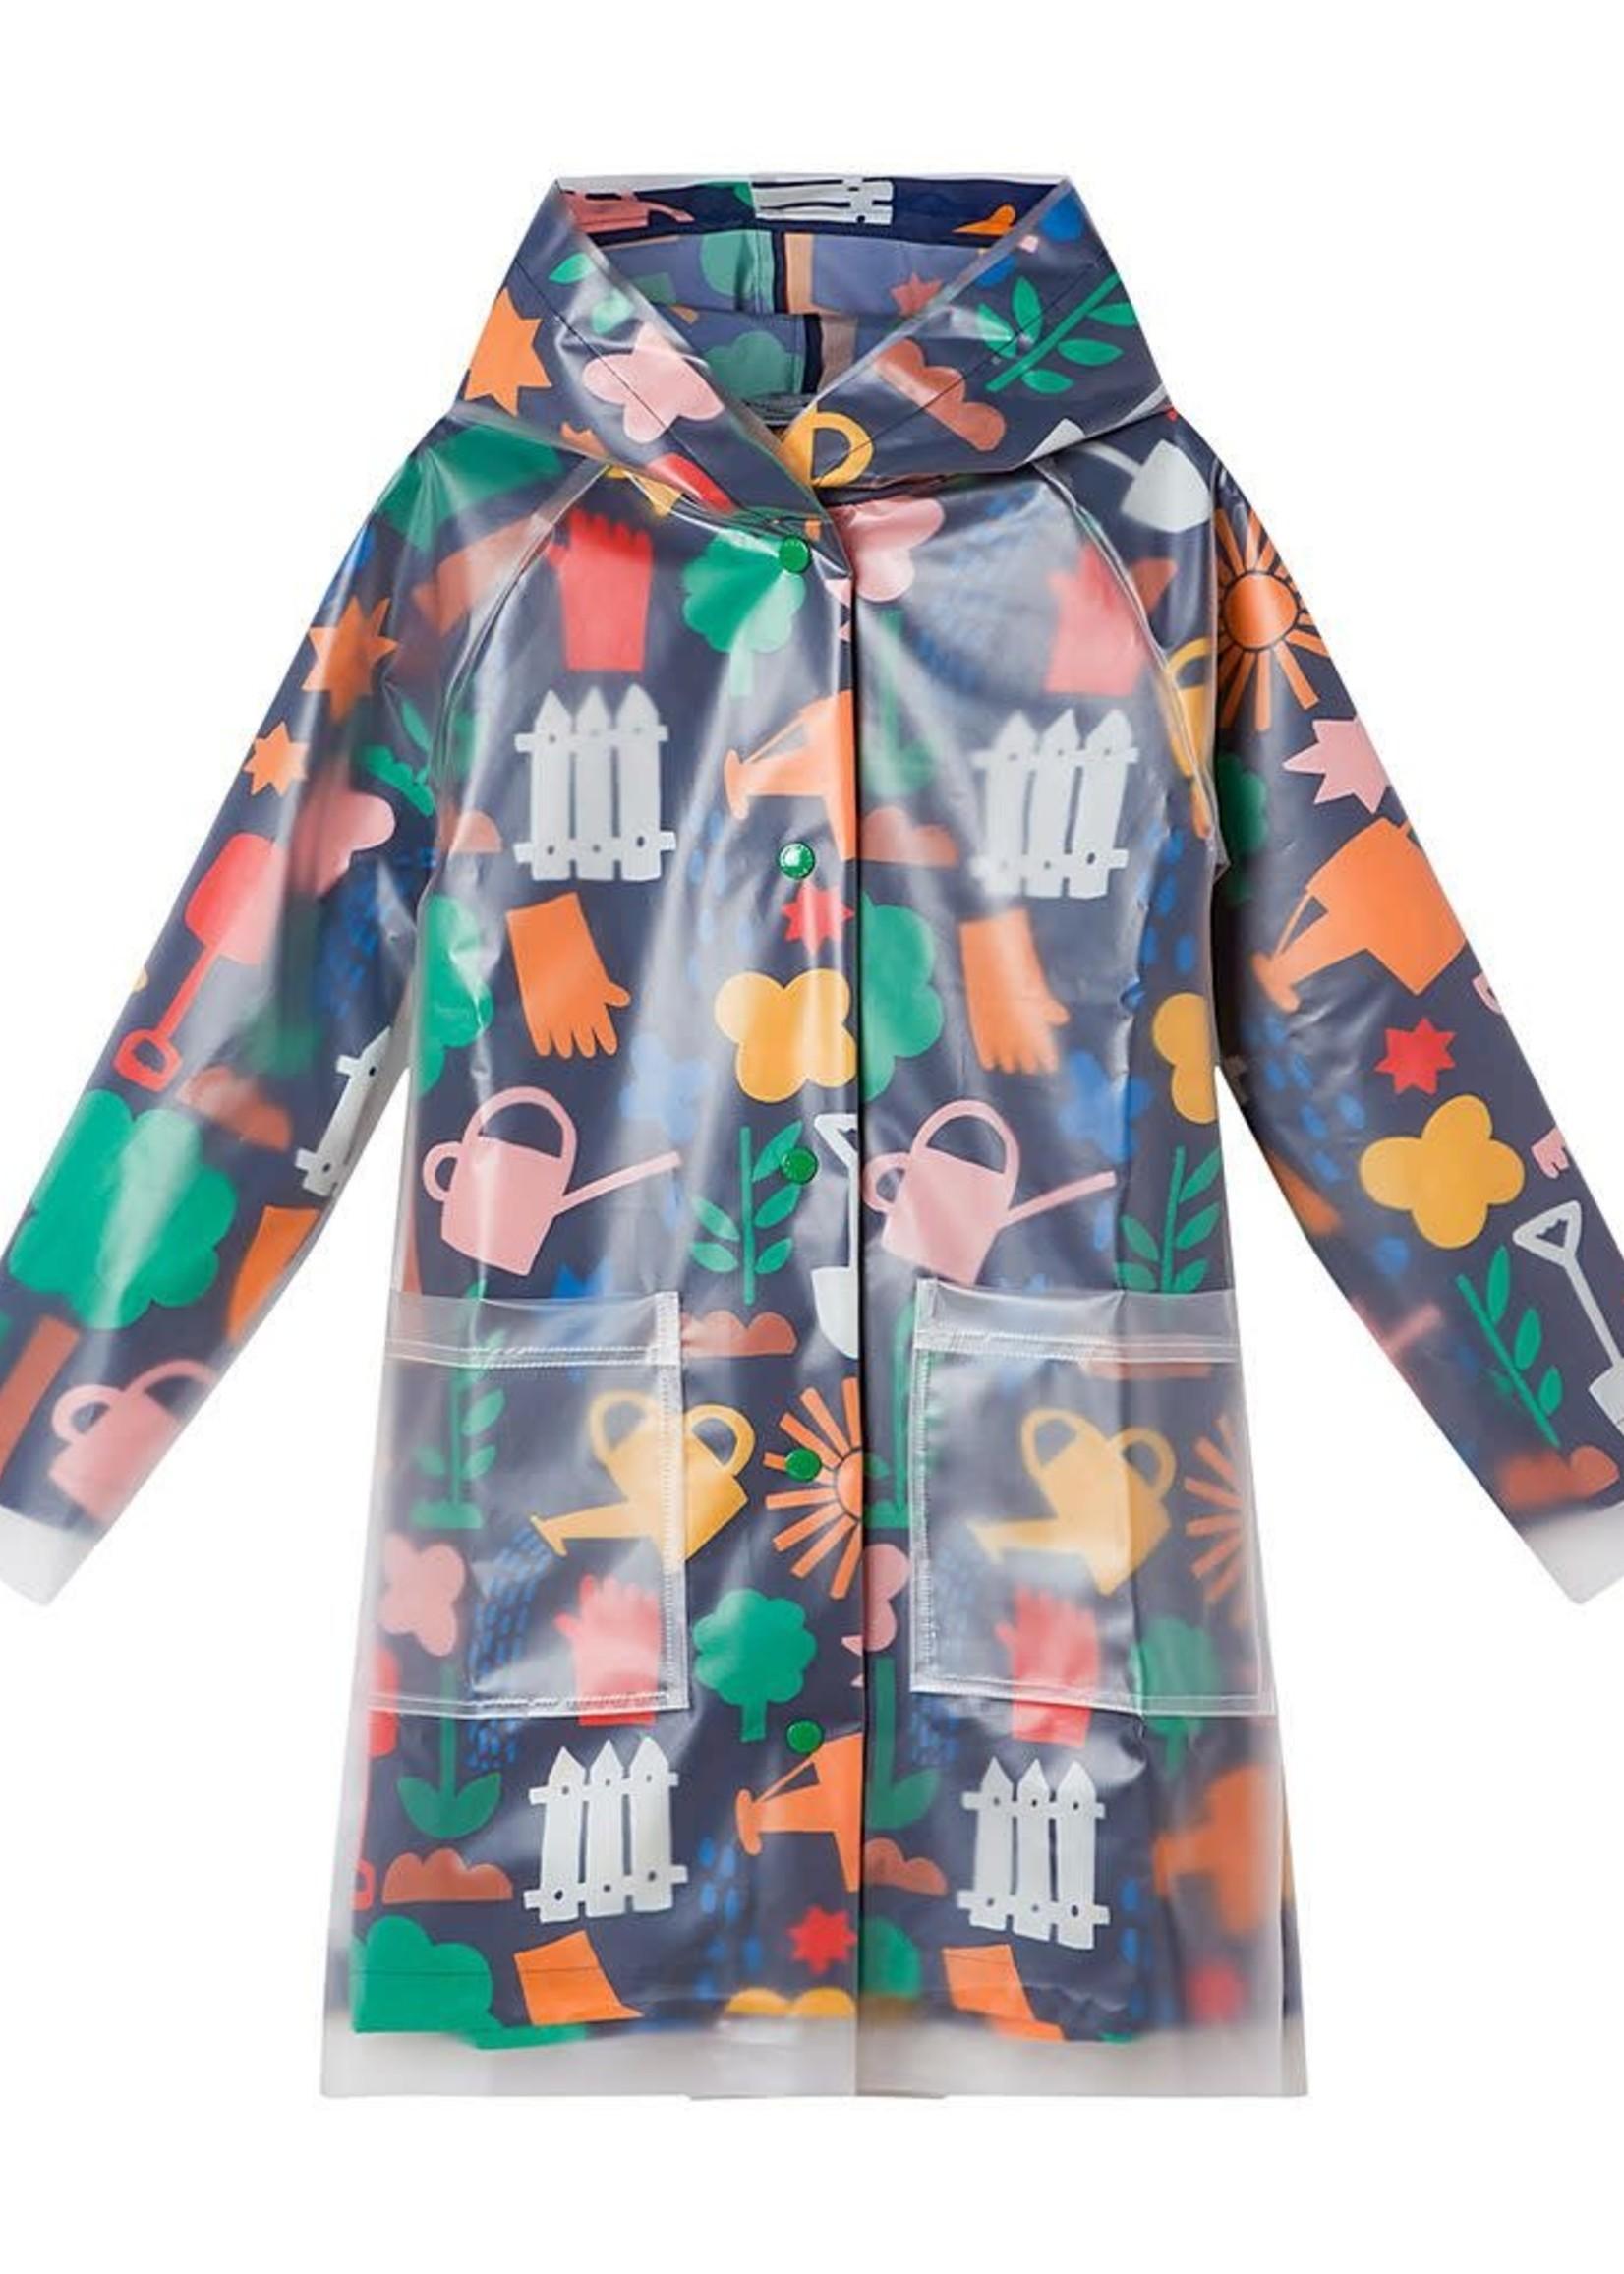 Stella McCartney Stella McCartney-AW21 603309 SRK37 KID GIRL GARDENING RAIN COAT